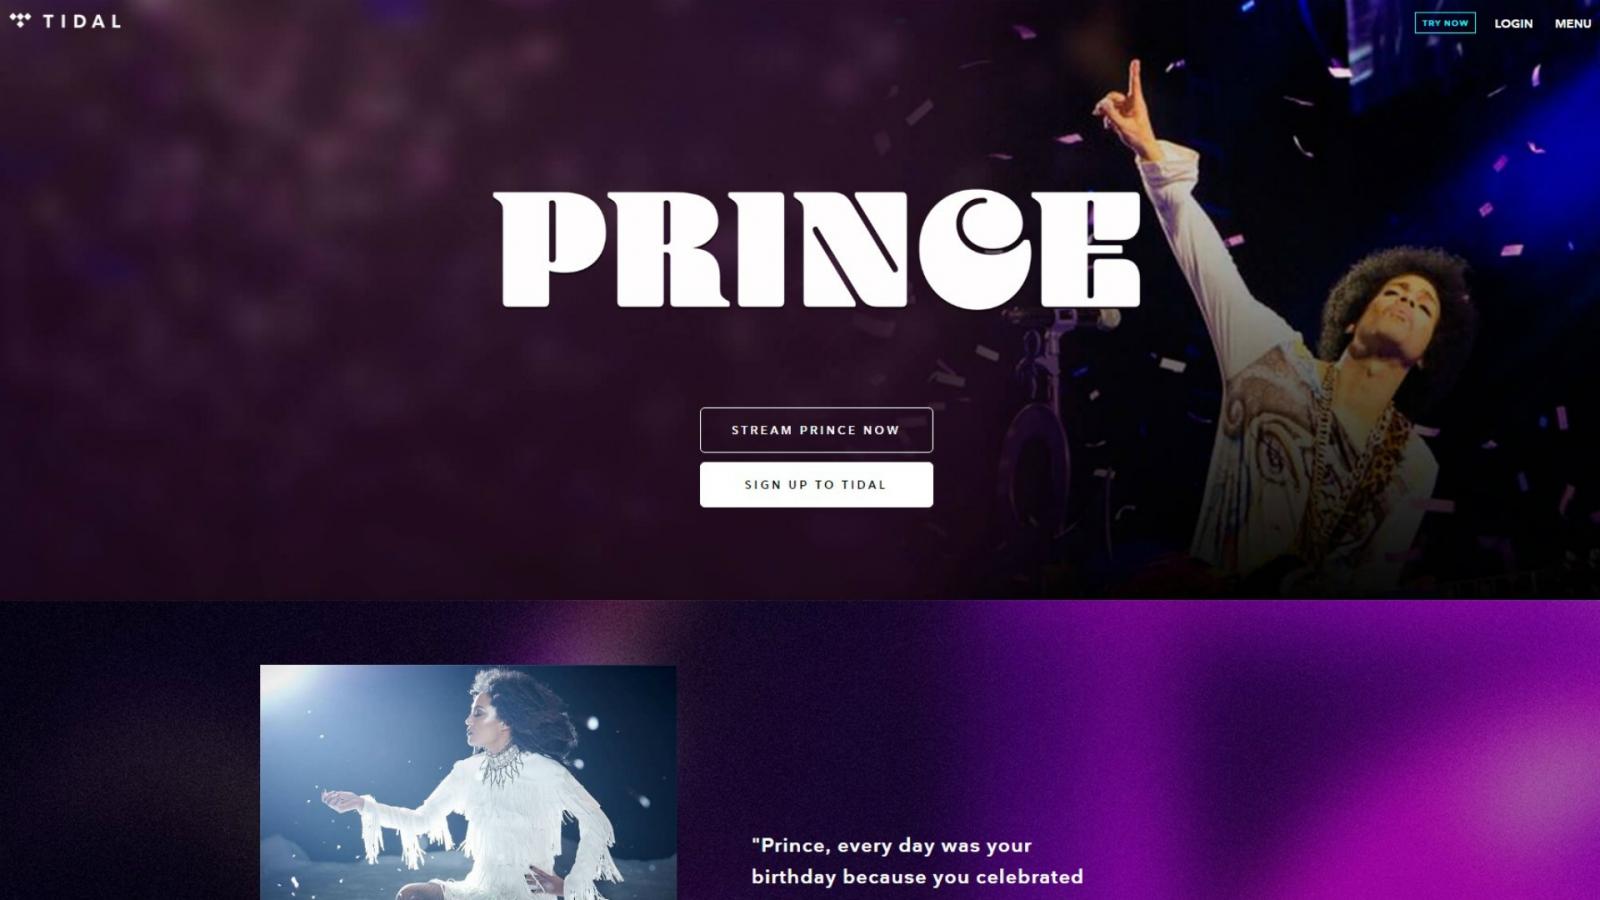 Prince Tidal